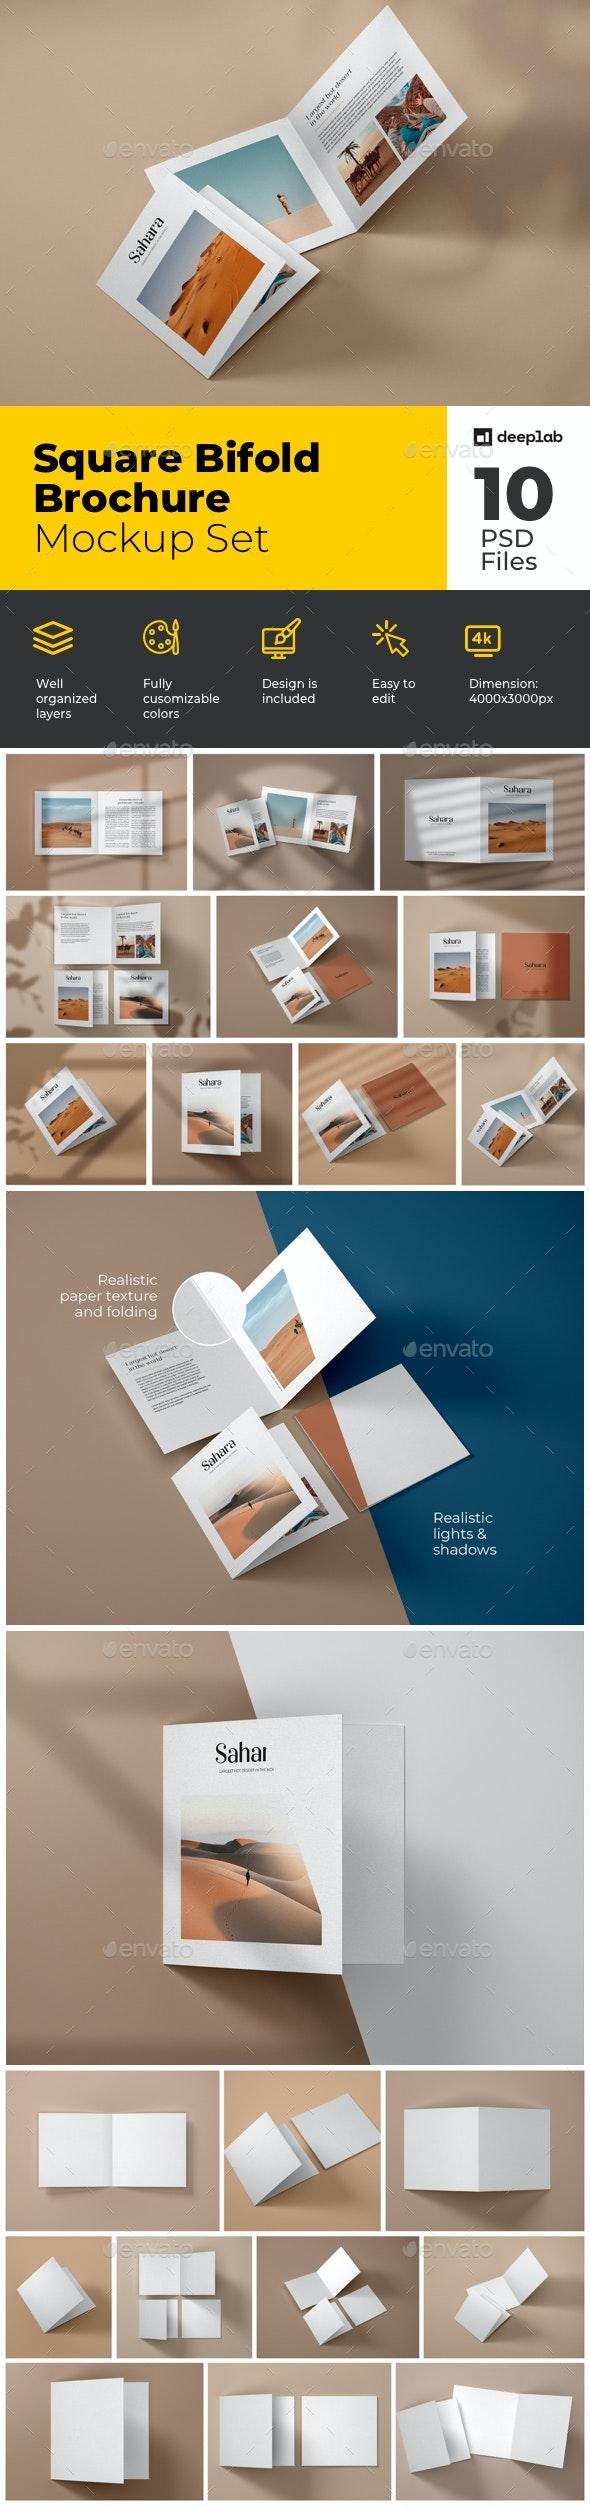 Square Bifold Brochure Mockup Set - Product Mock-Ups Graphics